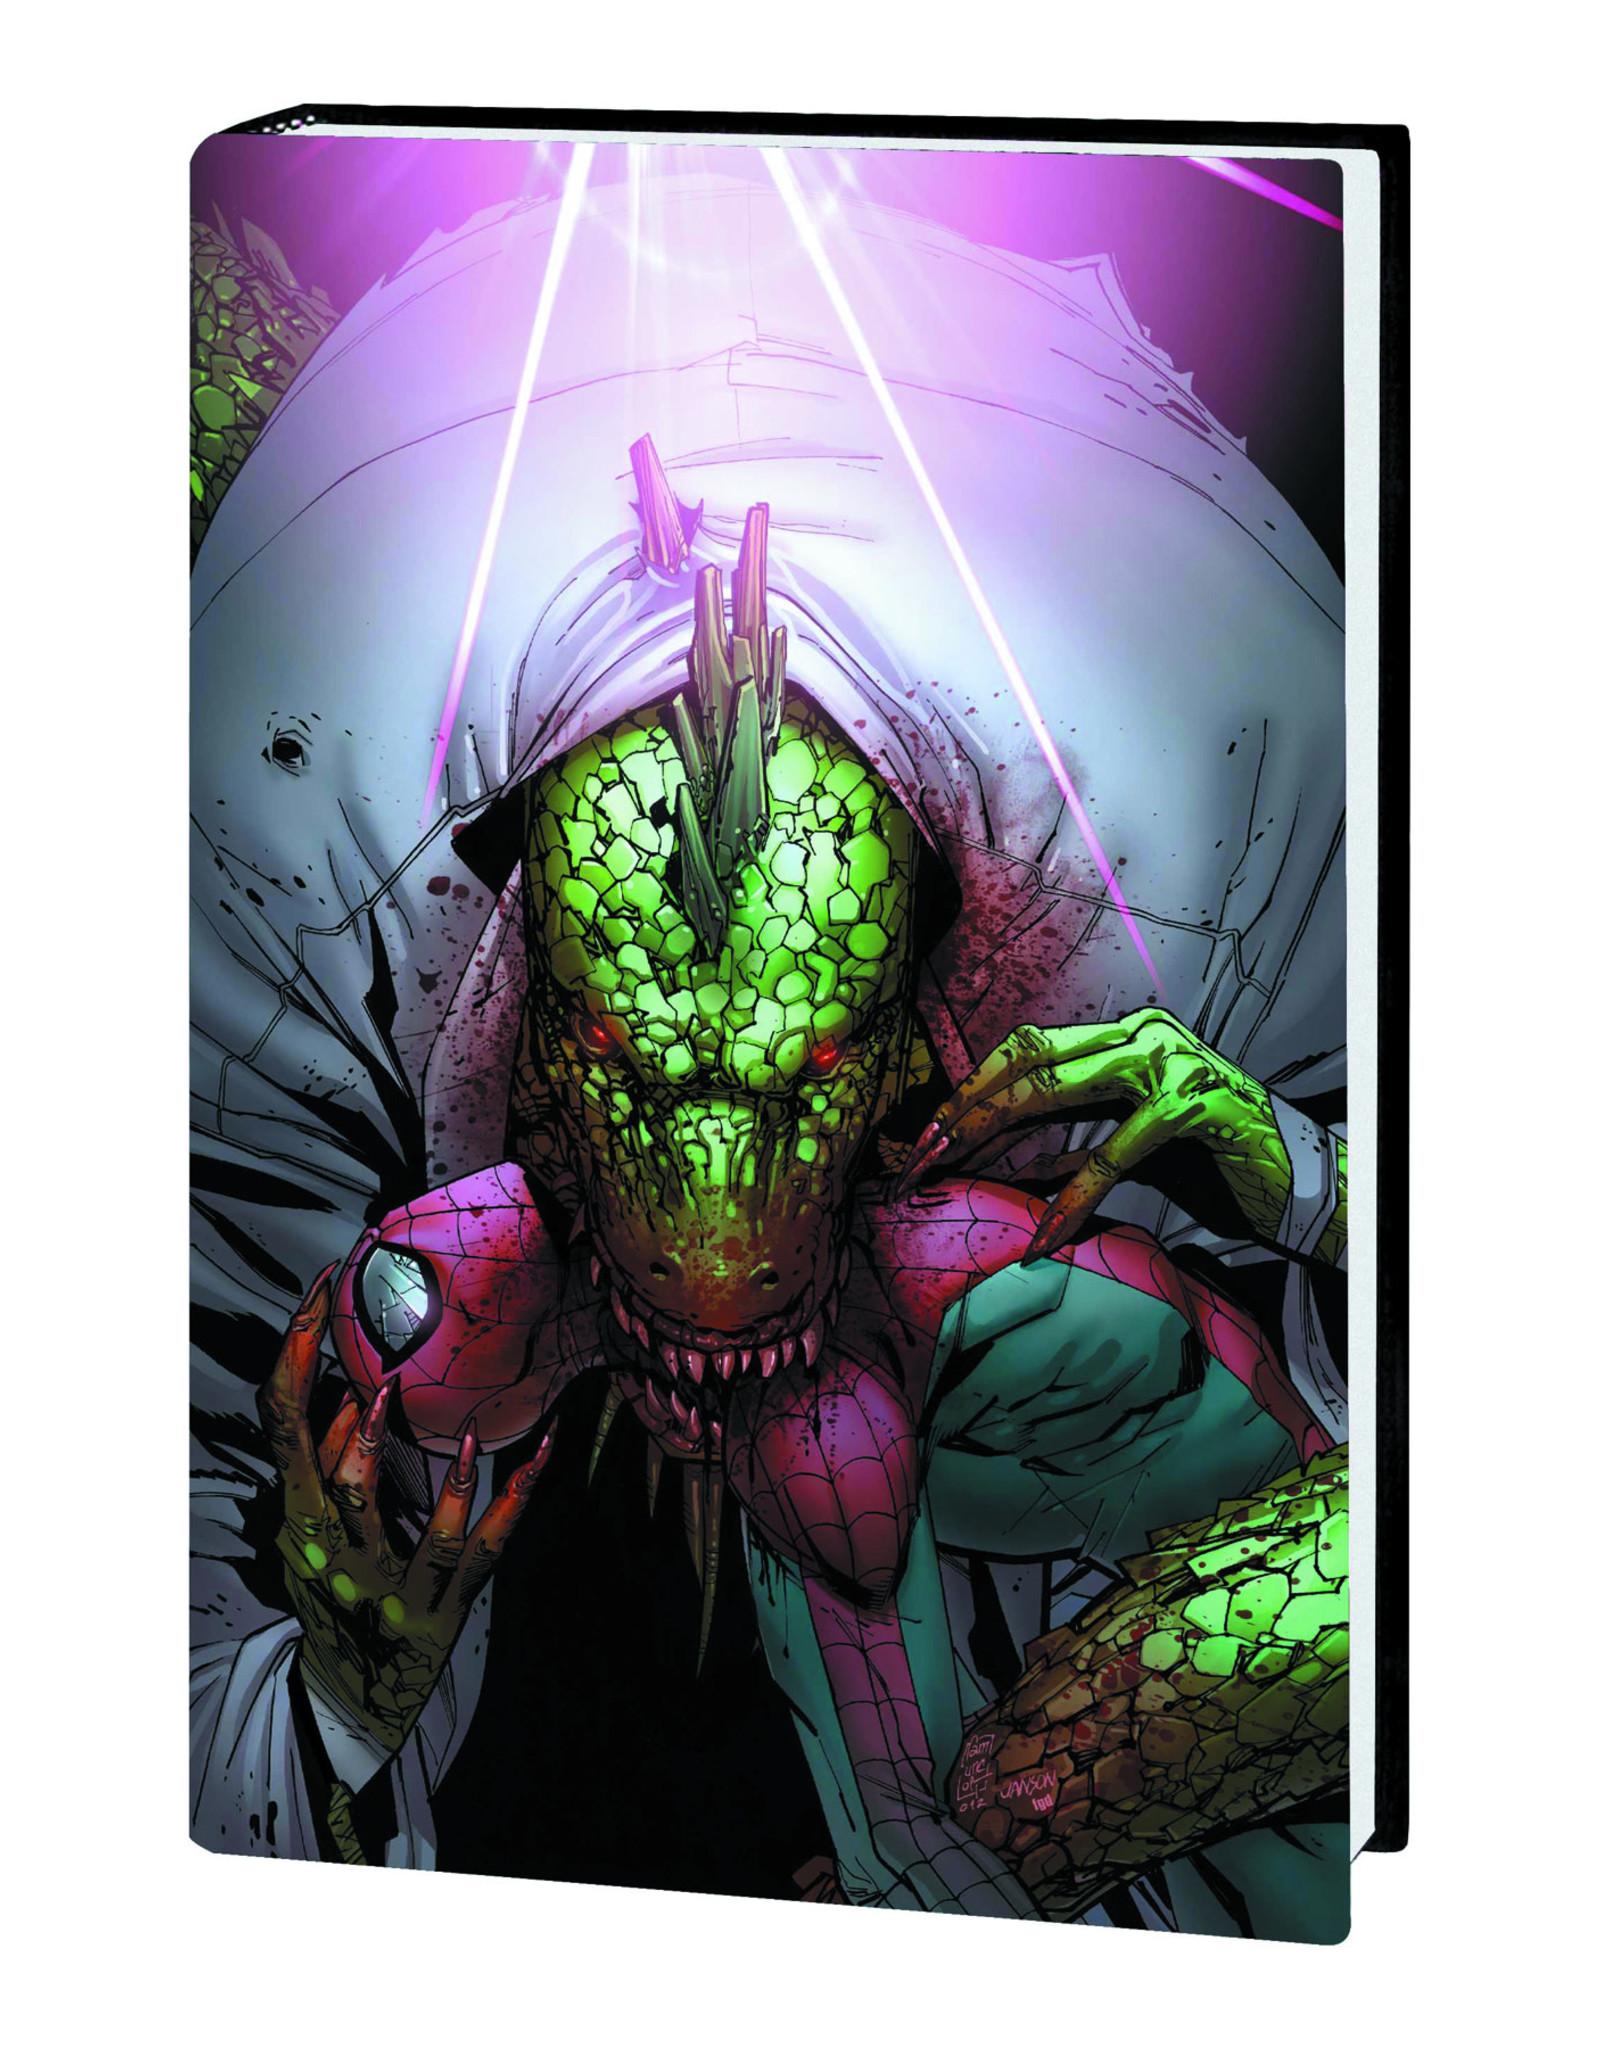 MARVEL COMICS SPIDER-MAN LIZARD PREM HC NO TURNING BACK